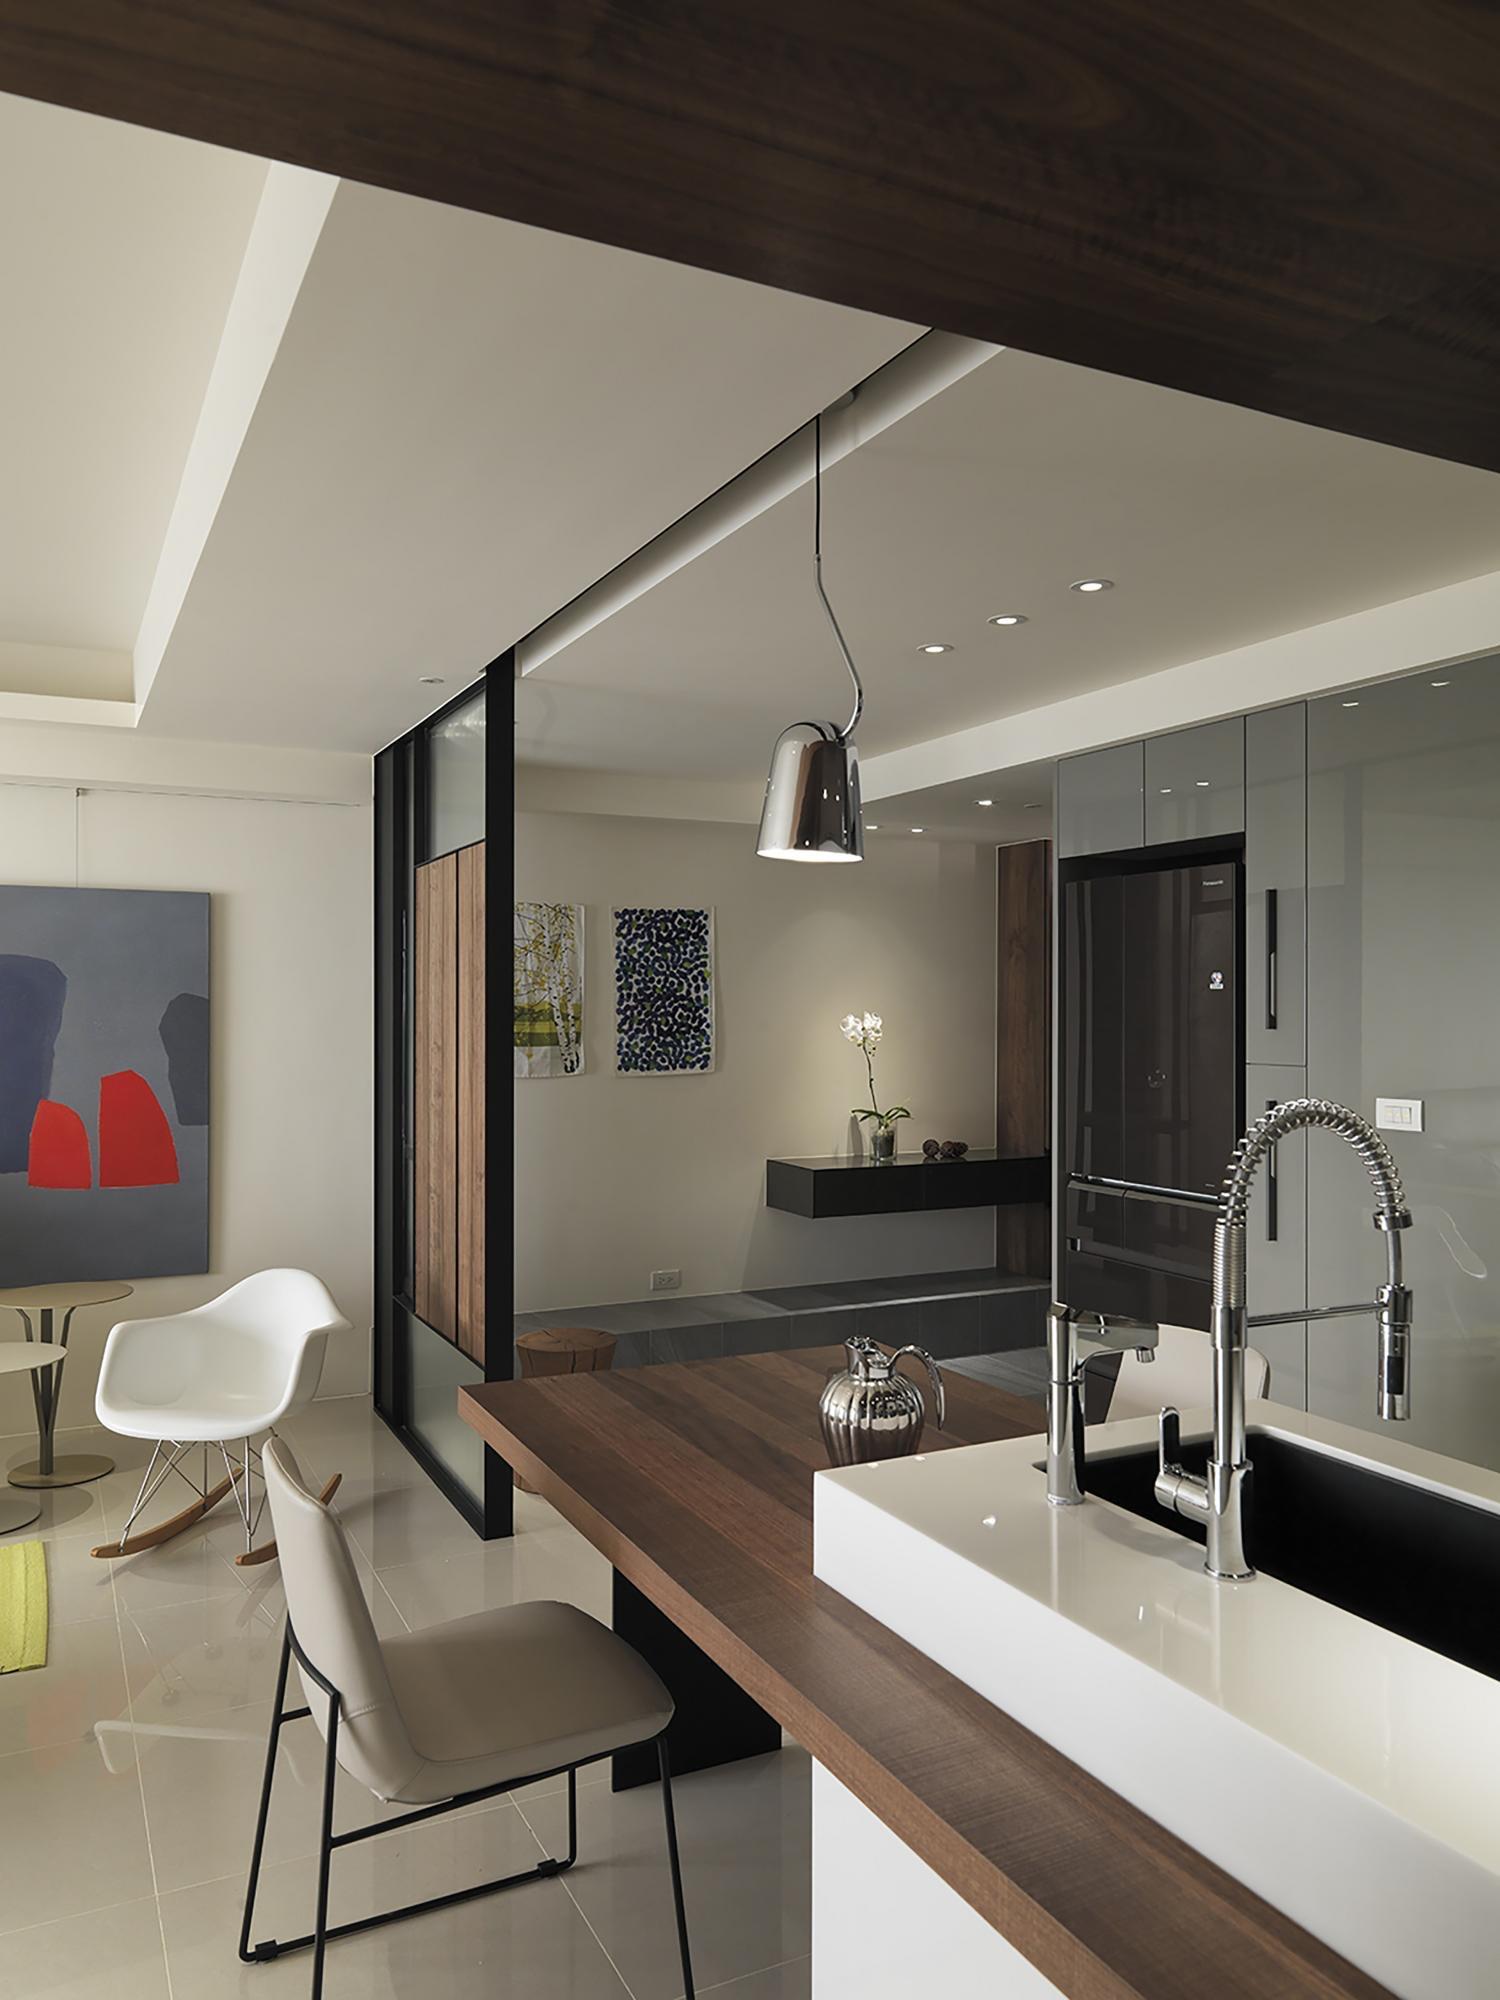 Interior Image 217